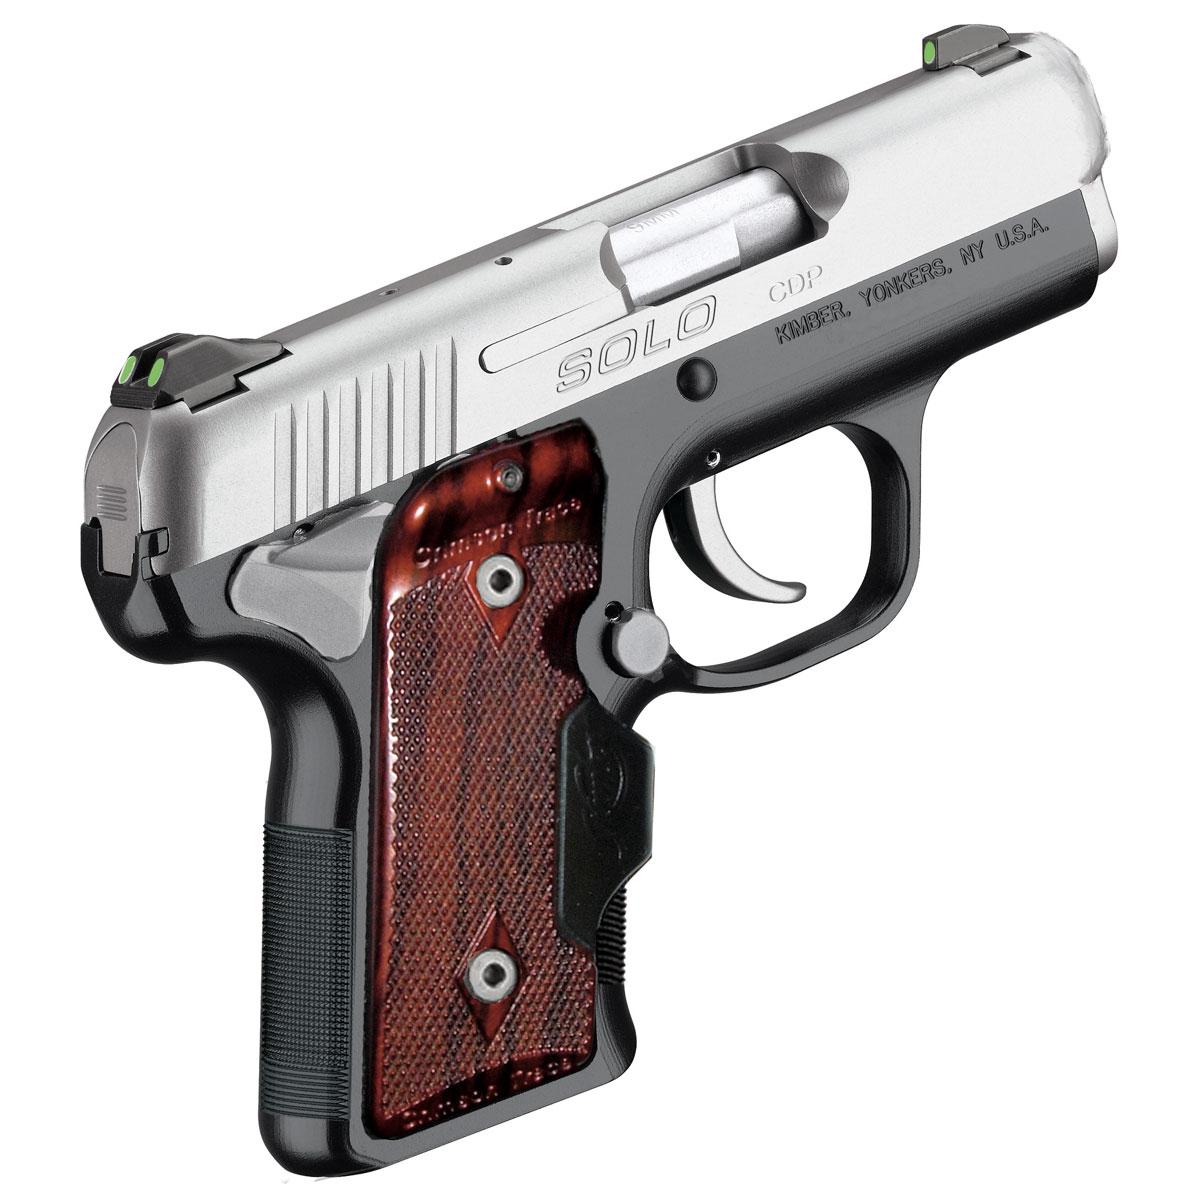 One of Maisie's favorite handguns